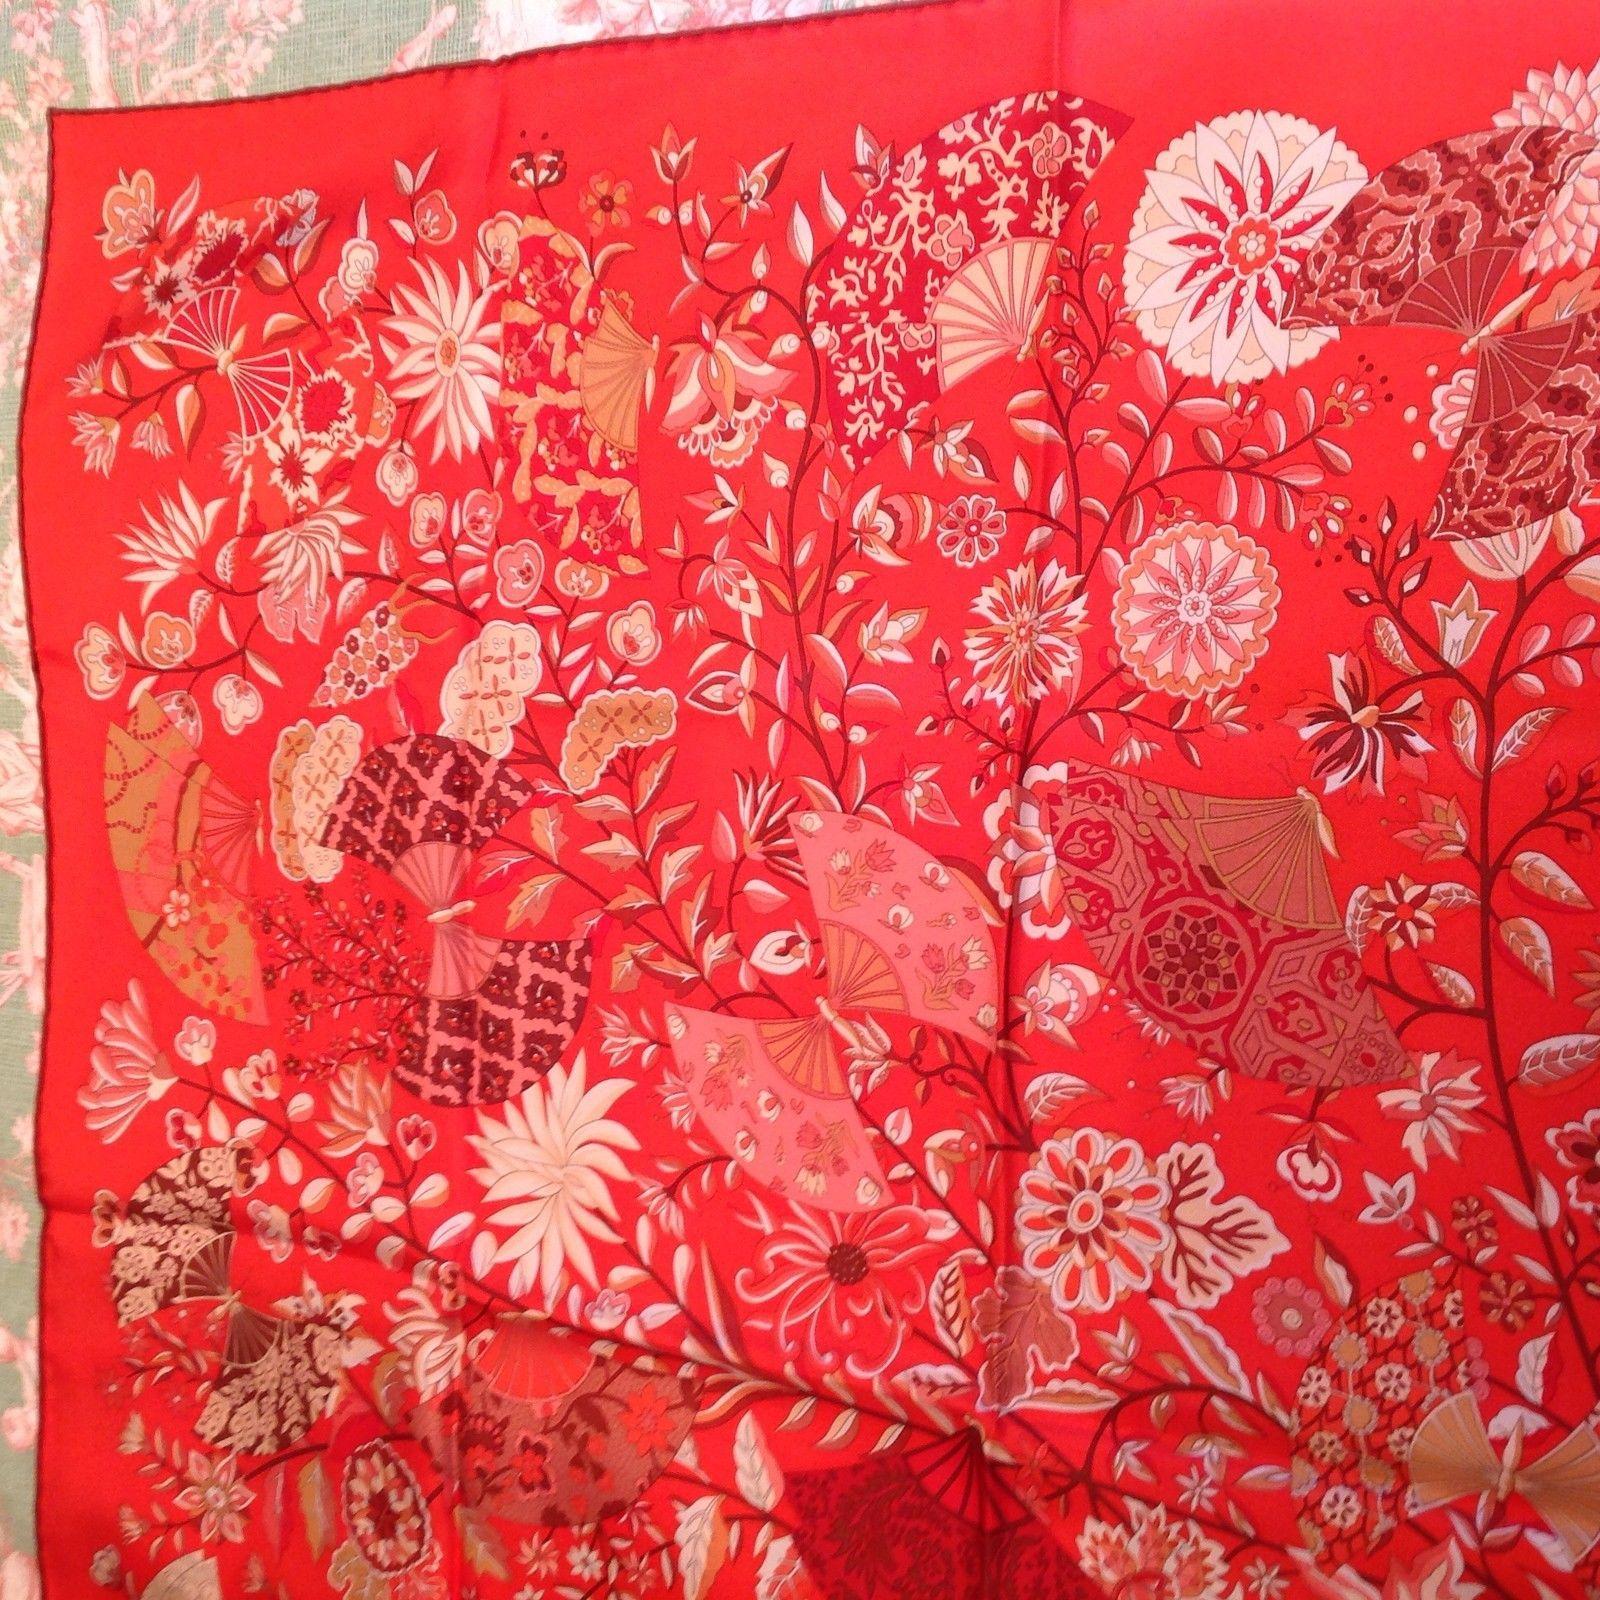 Hermes Fleurs Et Papillons de Tissus Scarf Tags Removed But Inc with Receipt | eBay